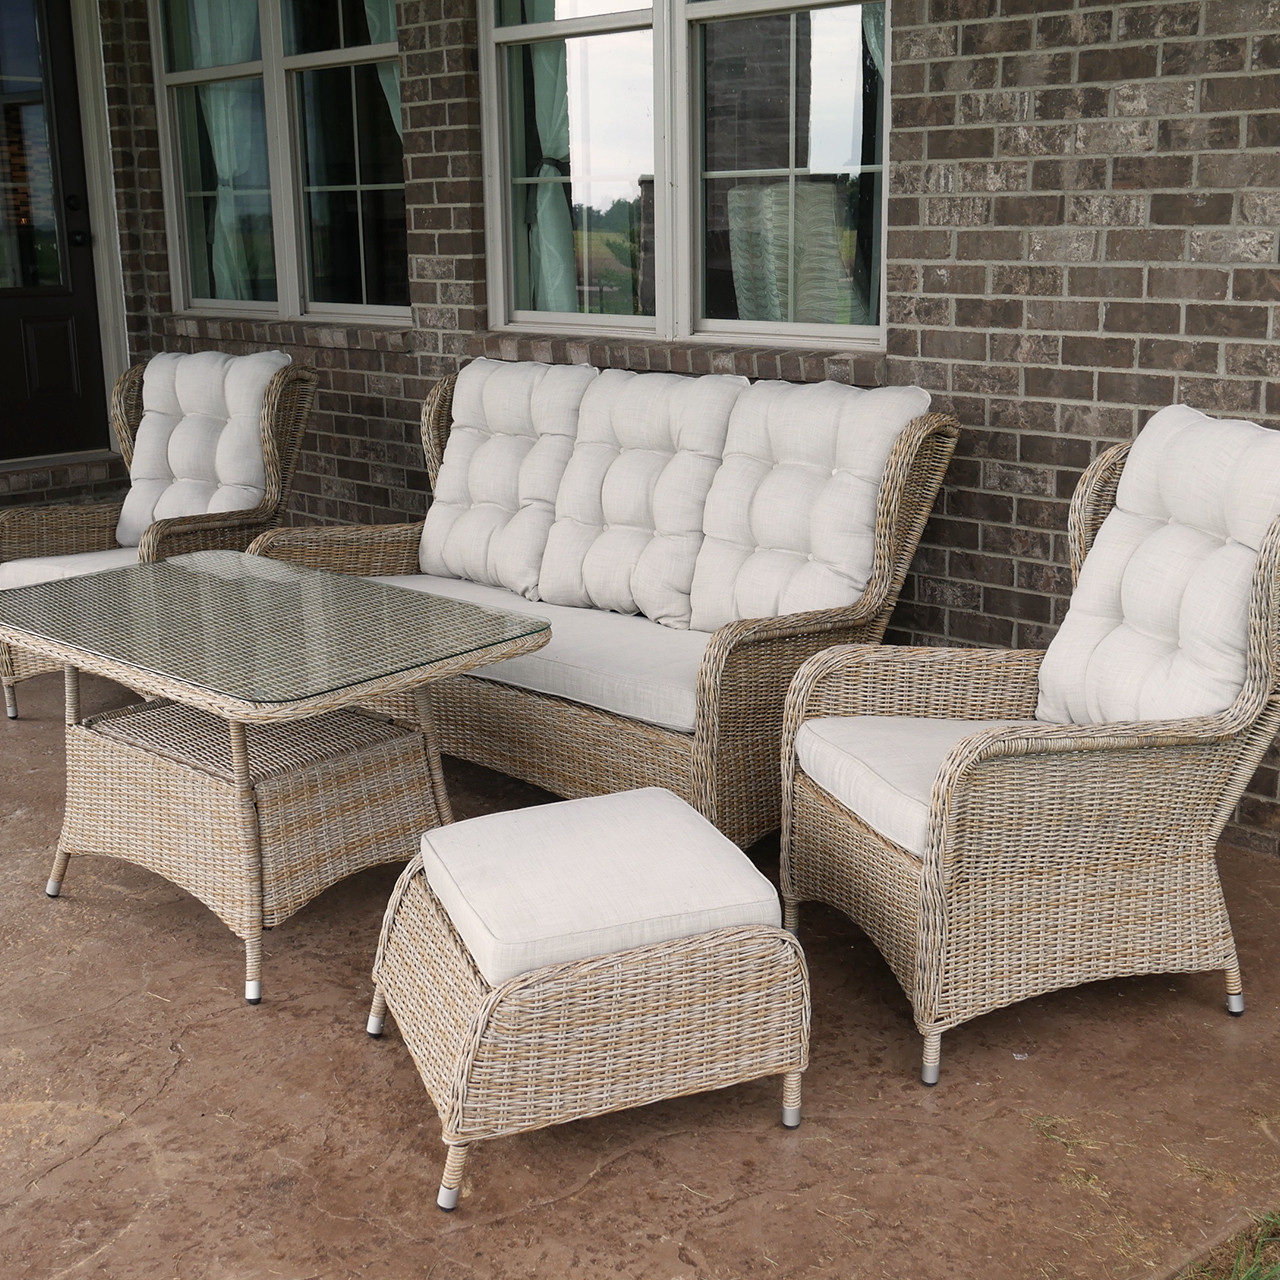 Charleston way wicker outdoor patio set